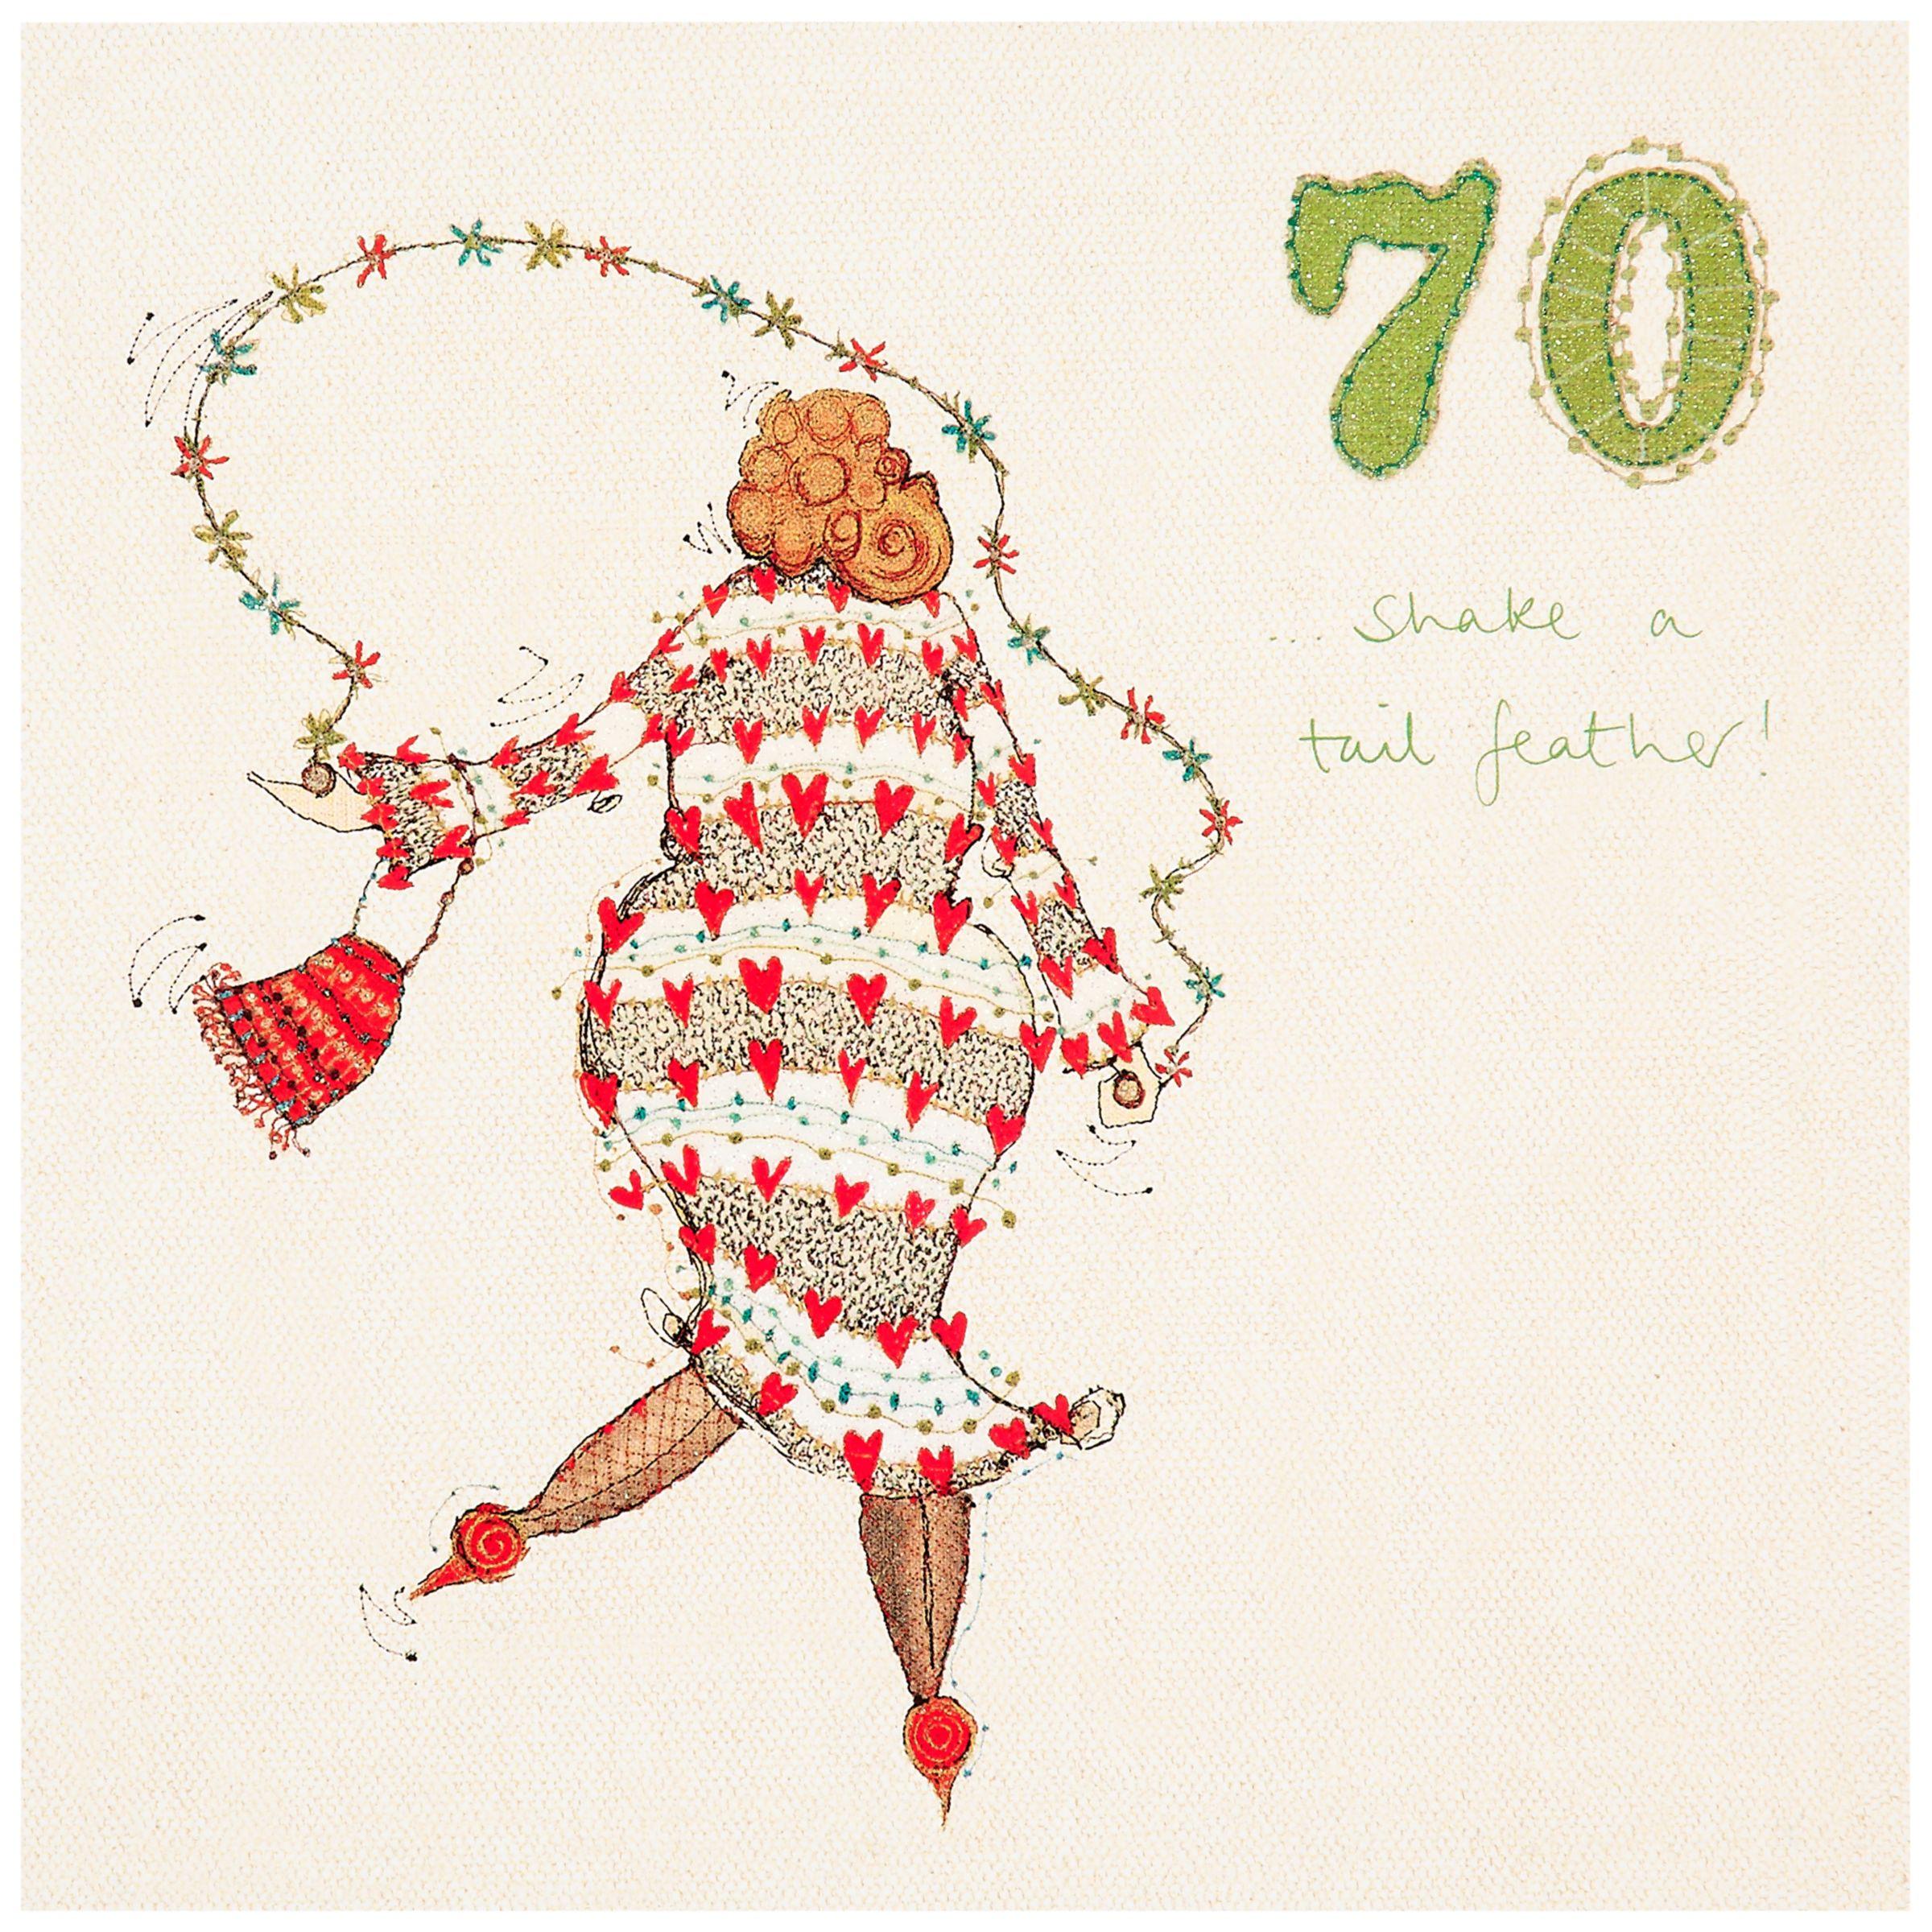 Woodmansterne 70th Birthday Card Bluewater